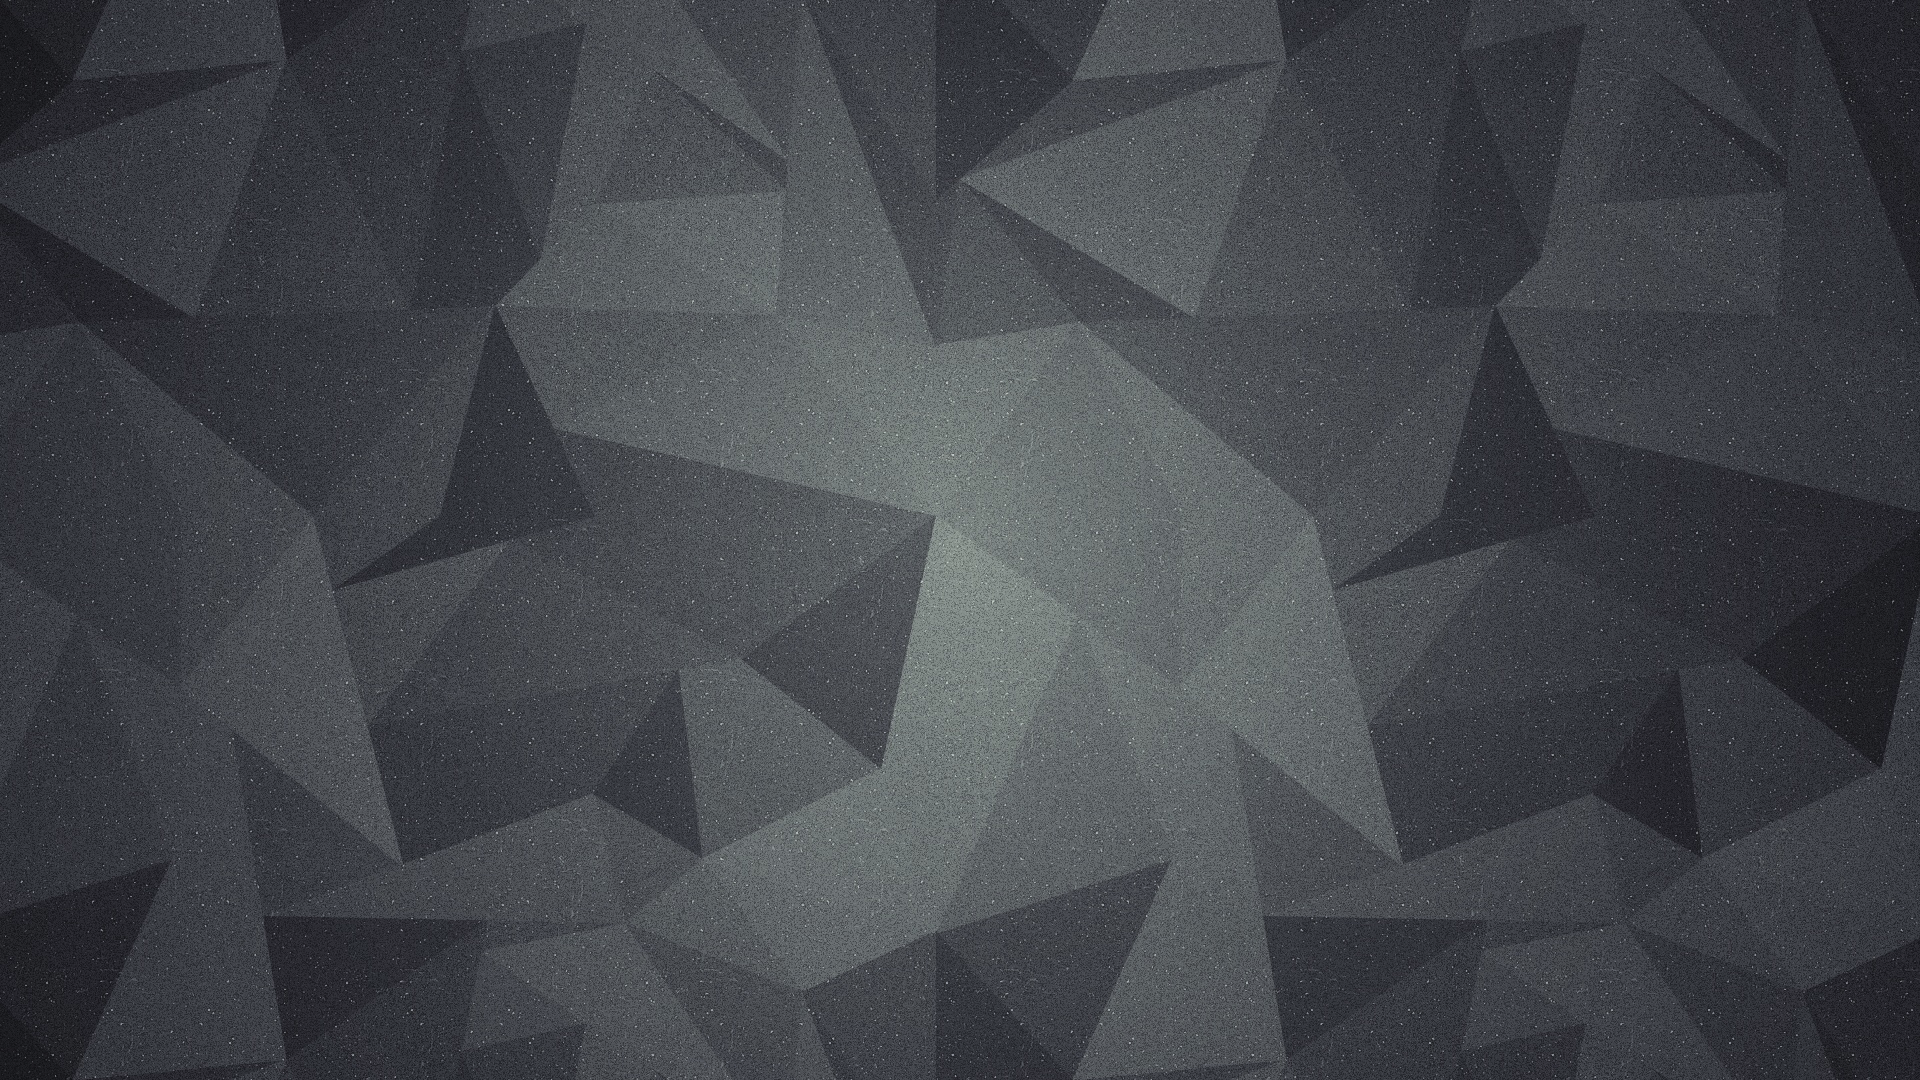 1920x1080 Abstract Geometric Shapes desktop PC and Mac wallpaper 1920x1080